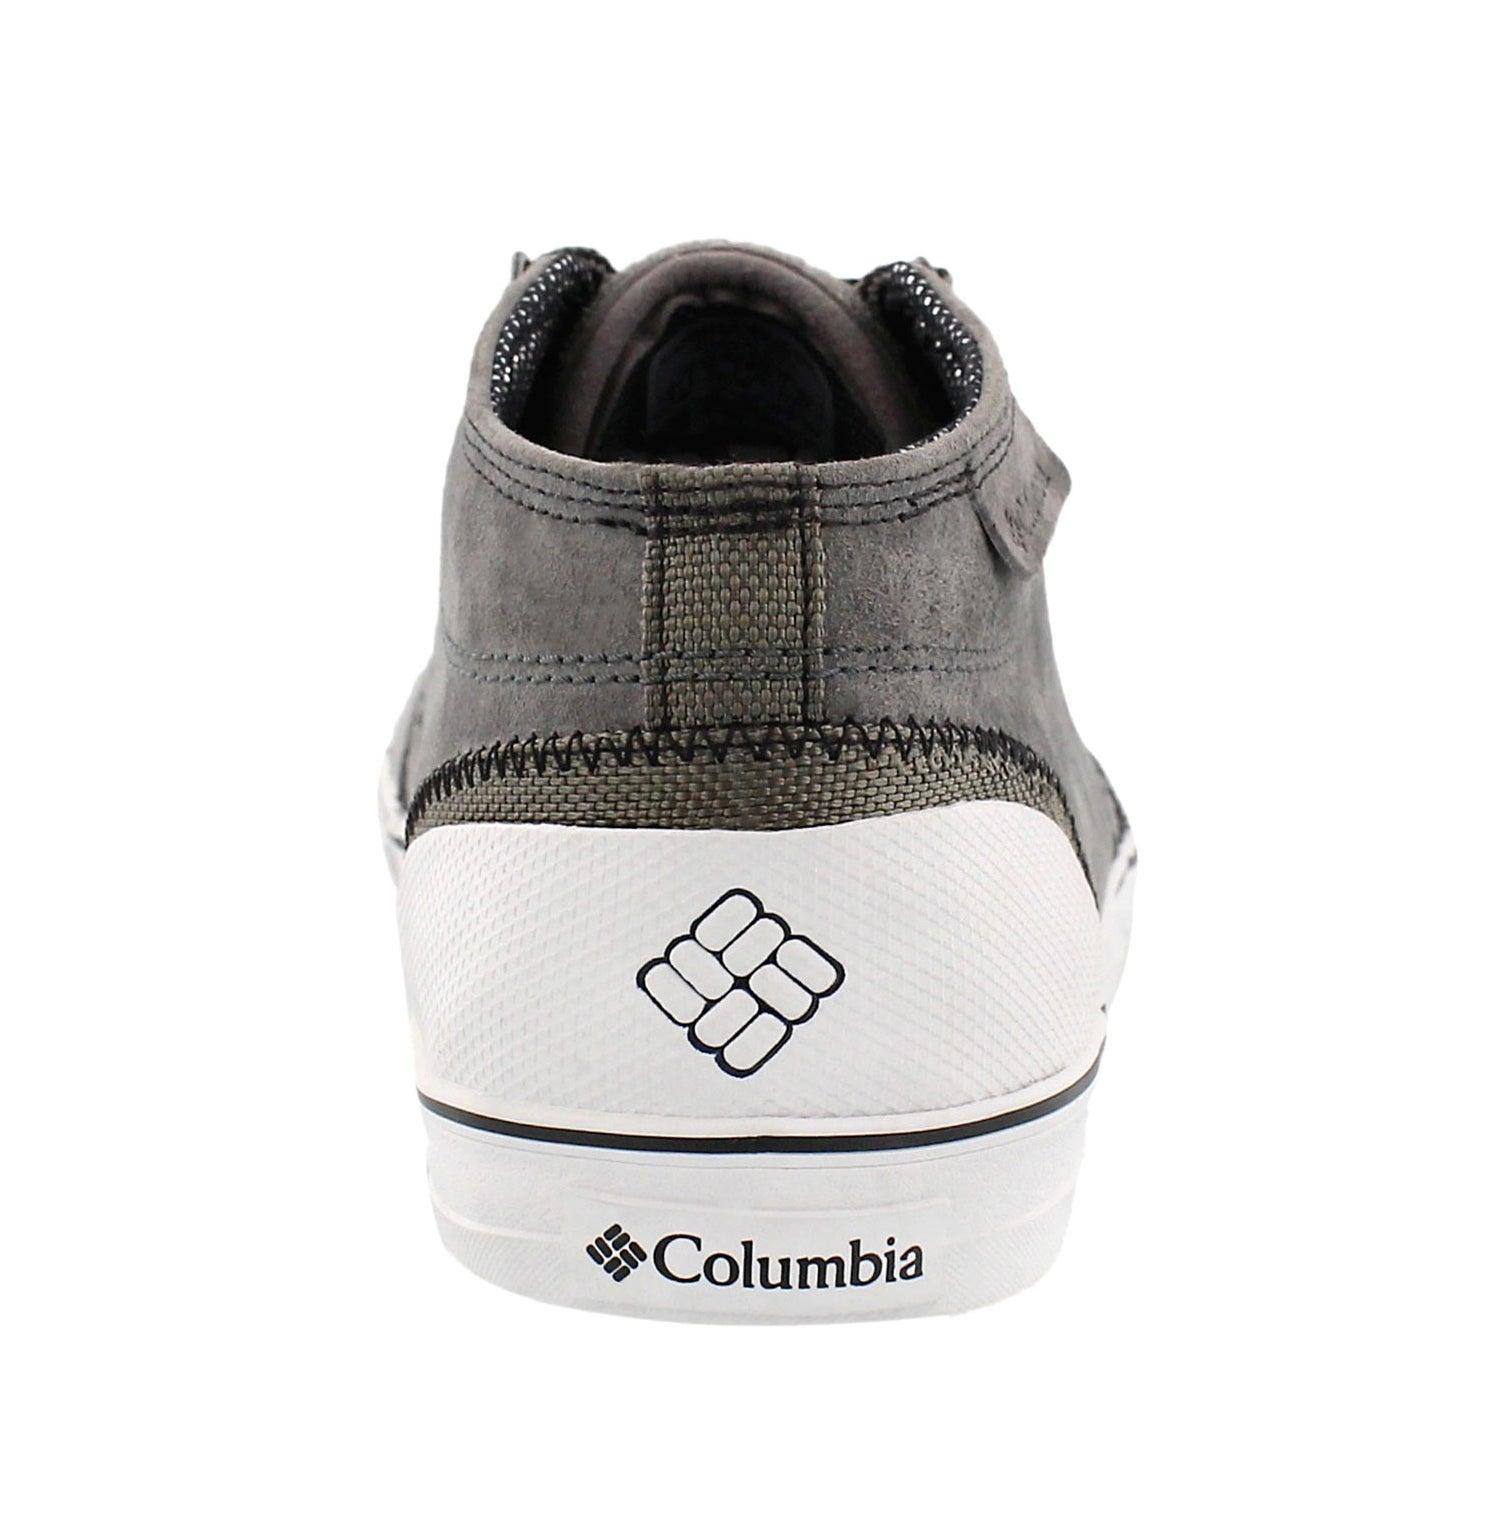 Mns Vulc Half Dome charcoal casual shoe